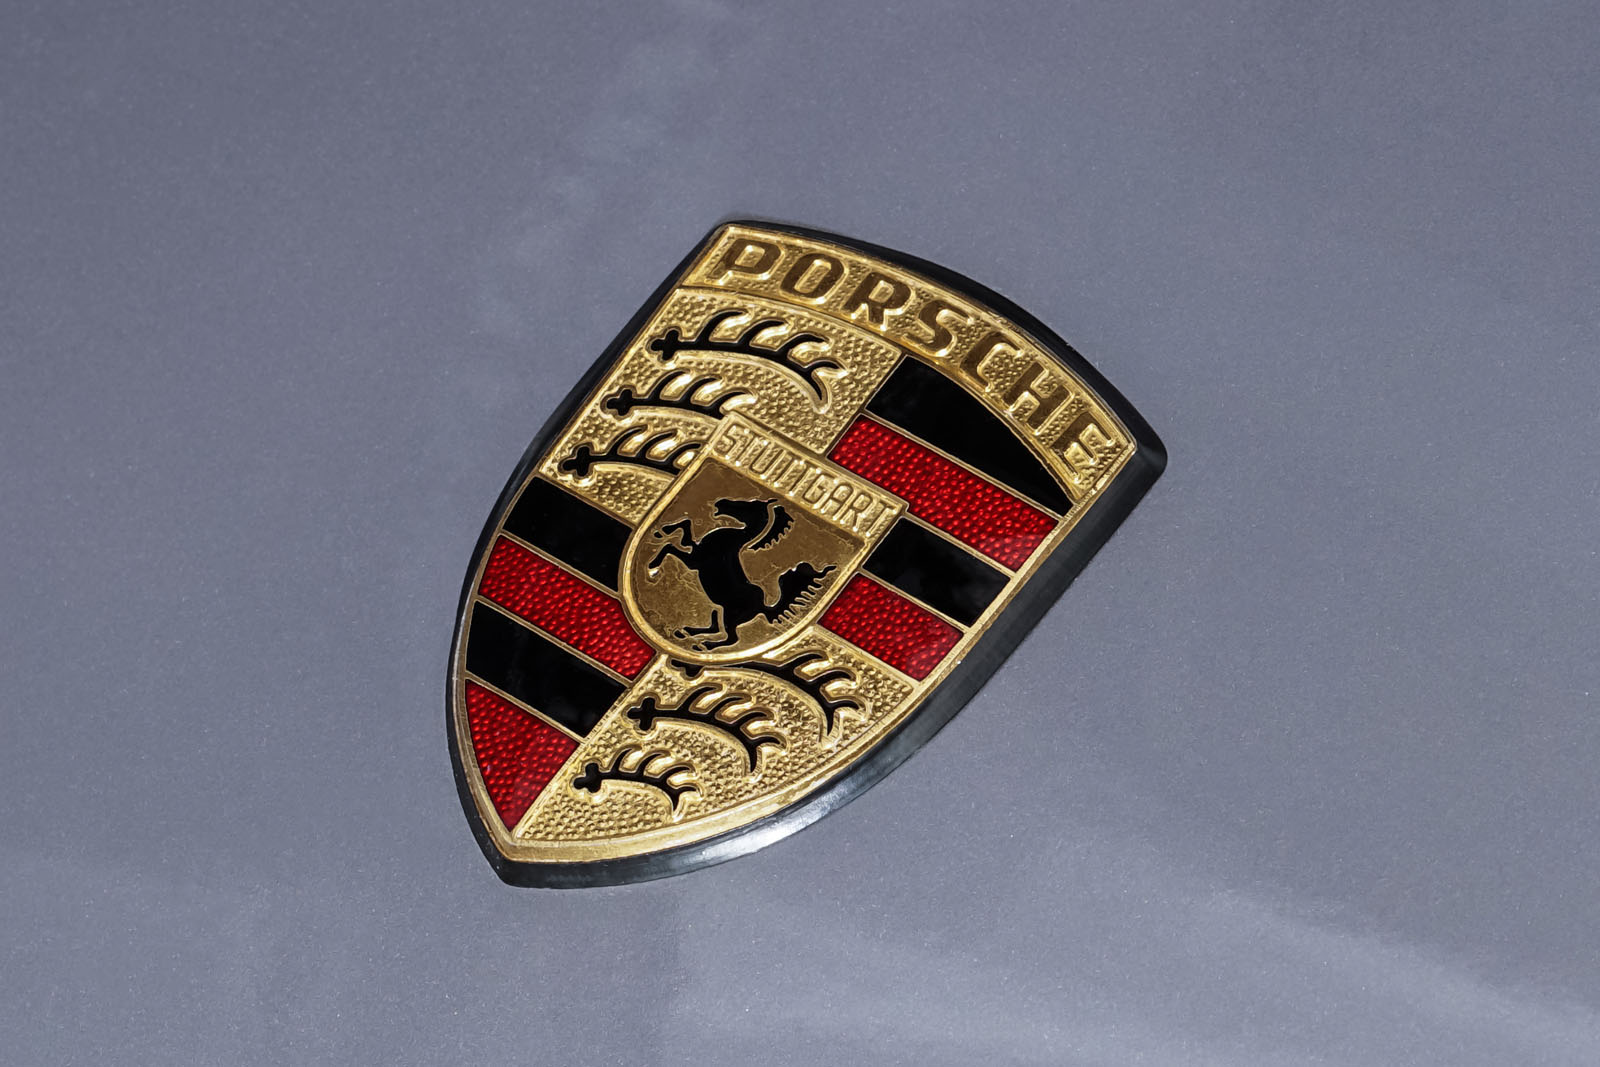 Porsche_911_Targa_Diamantblaumetallic_Blau_POR-0092_14_w